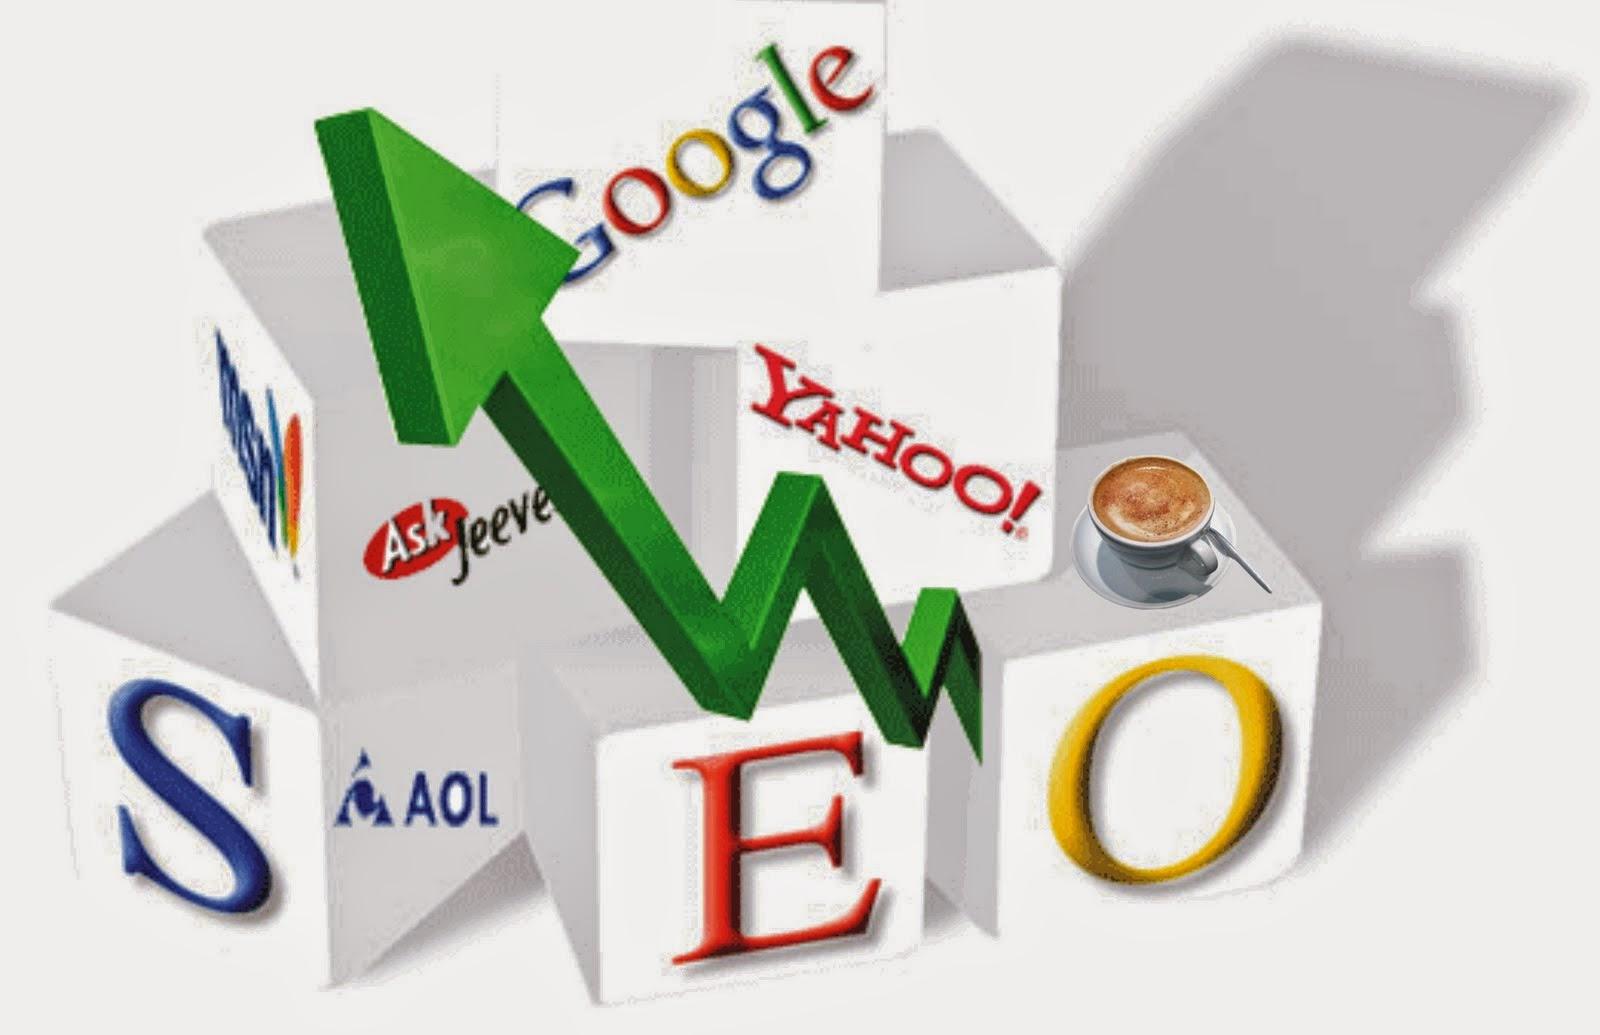 yahoo google seo image